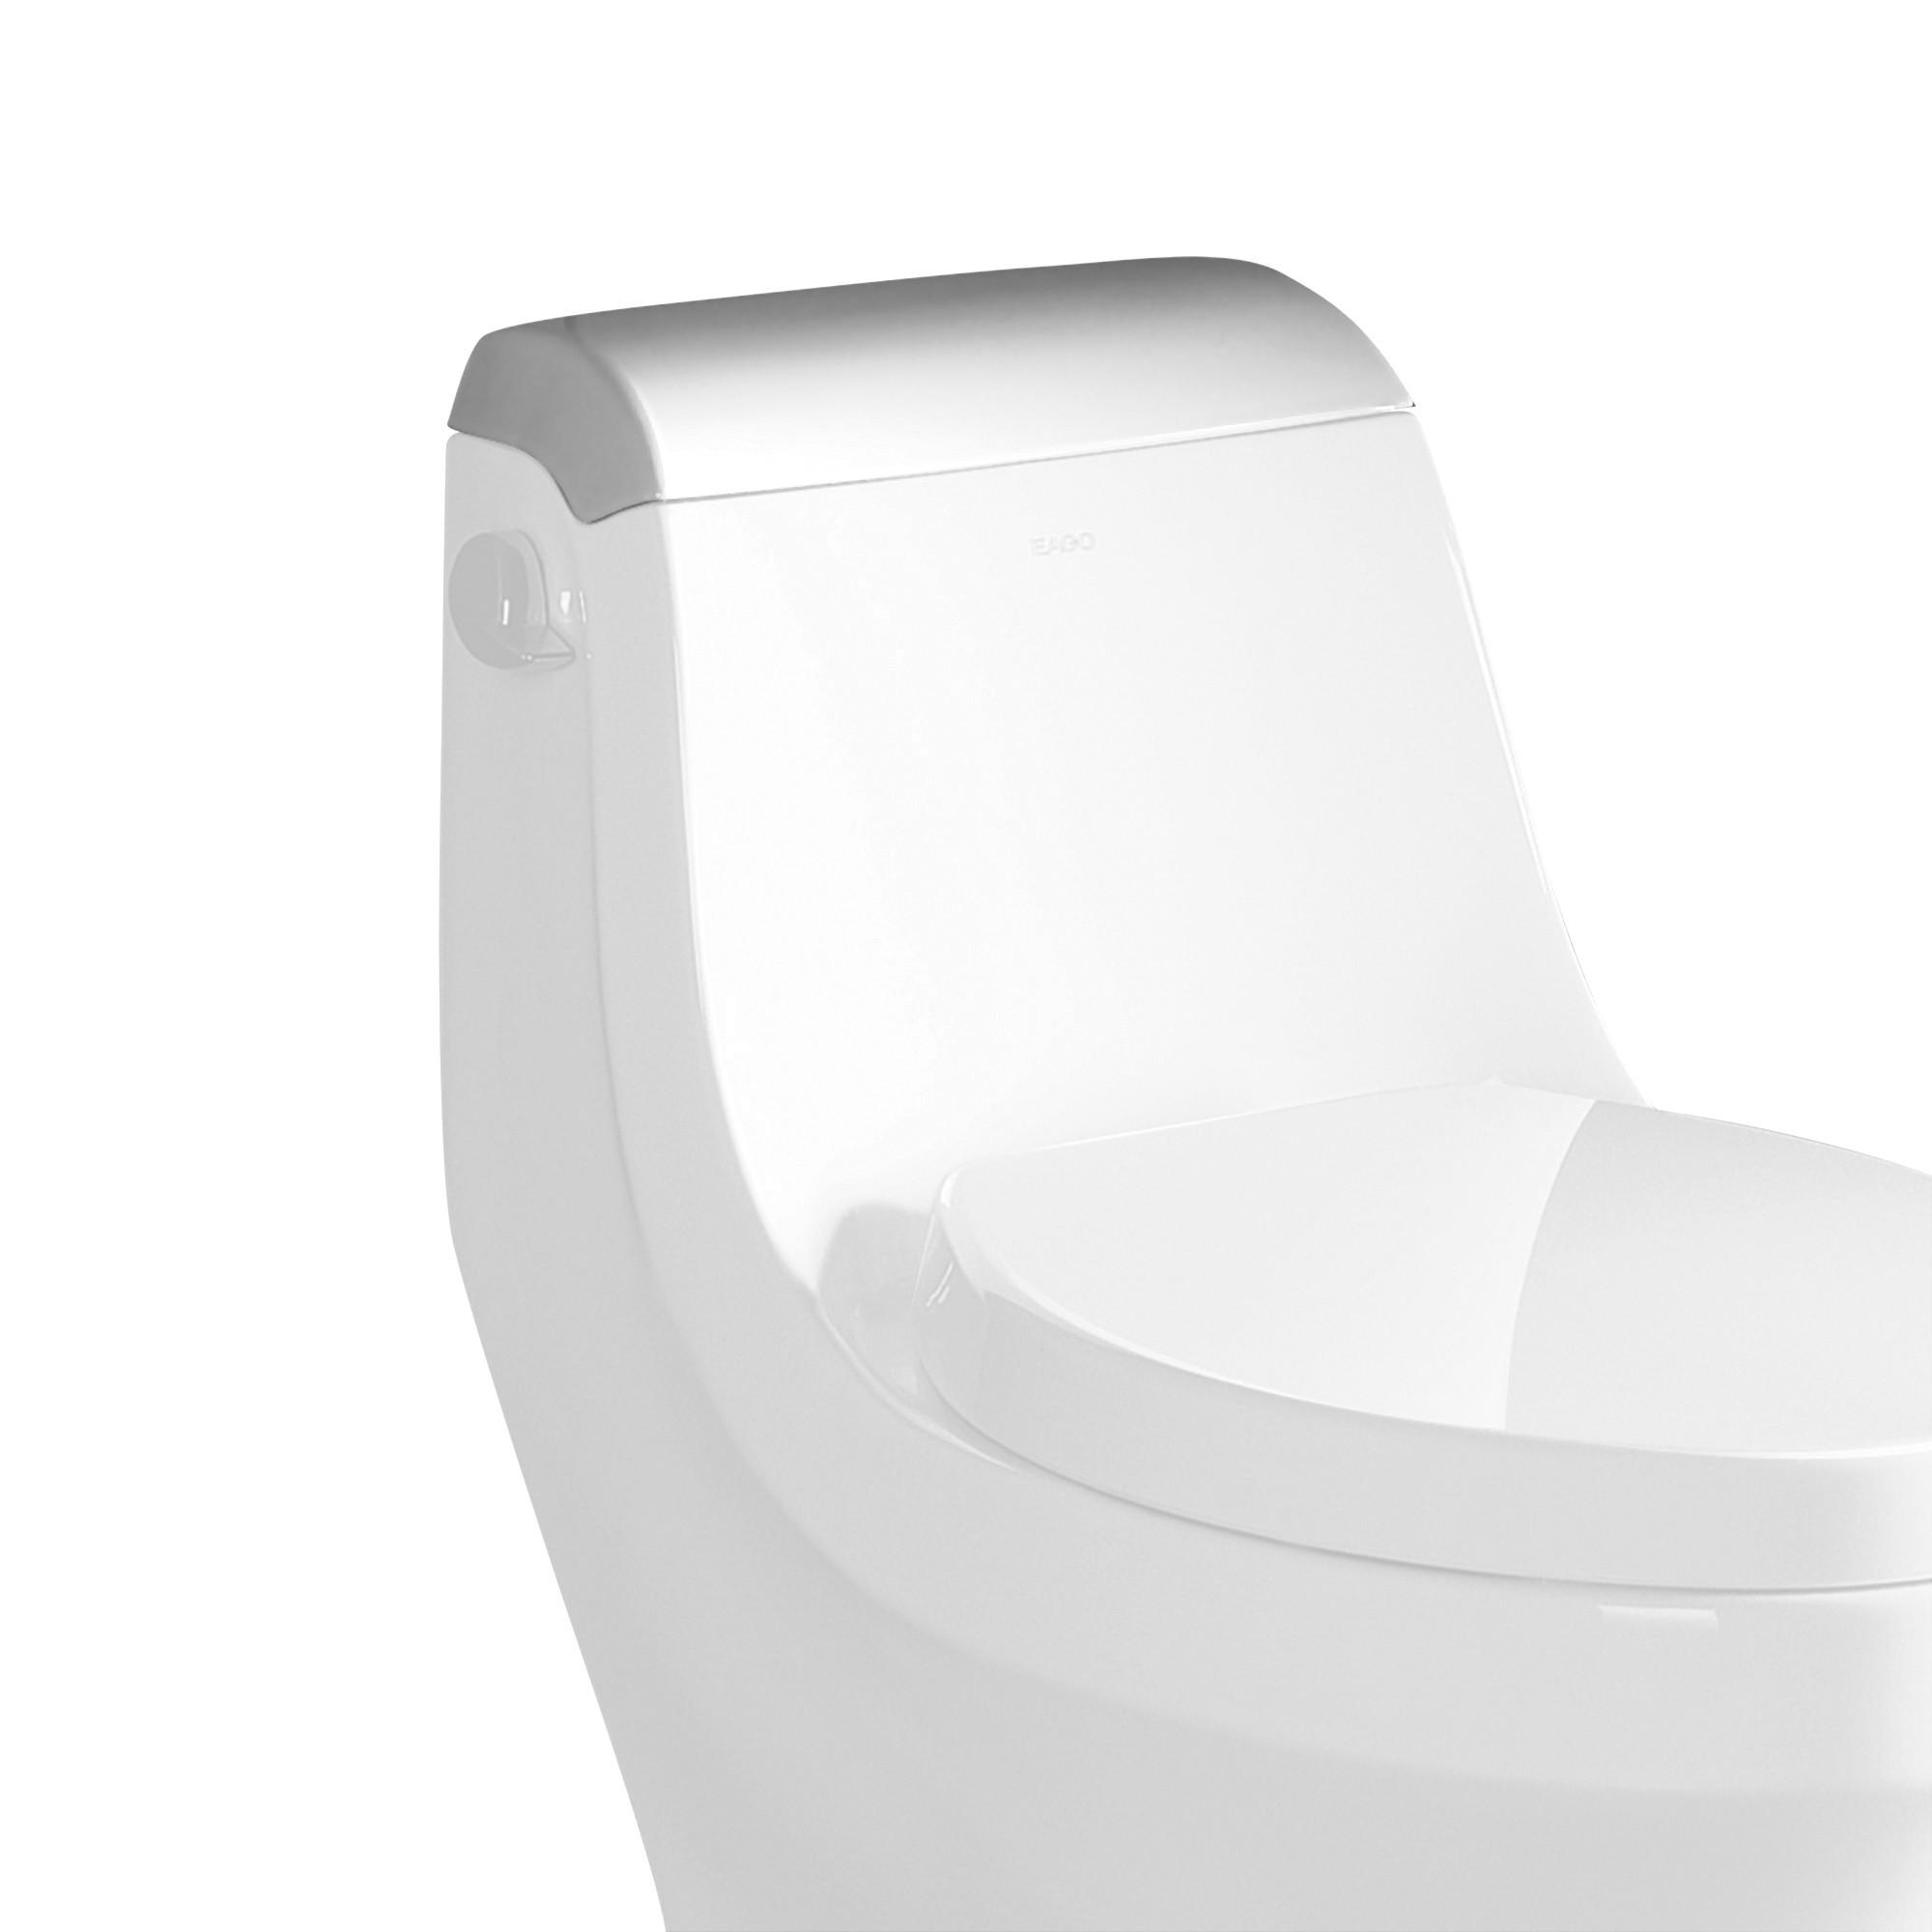 EAGO R-133LID Replacement Ceramic Toilet Lid for TB133